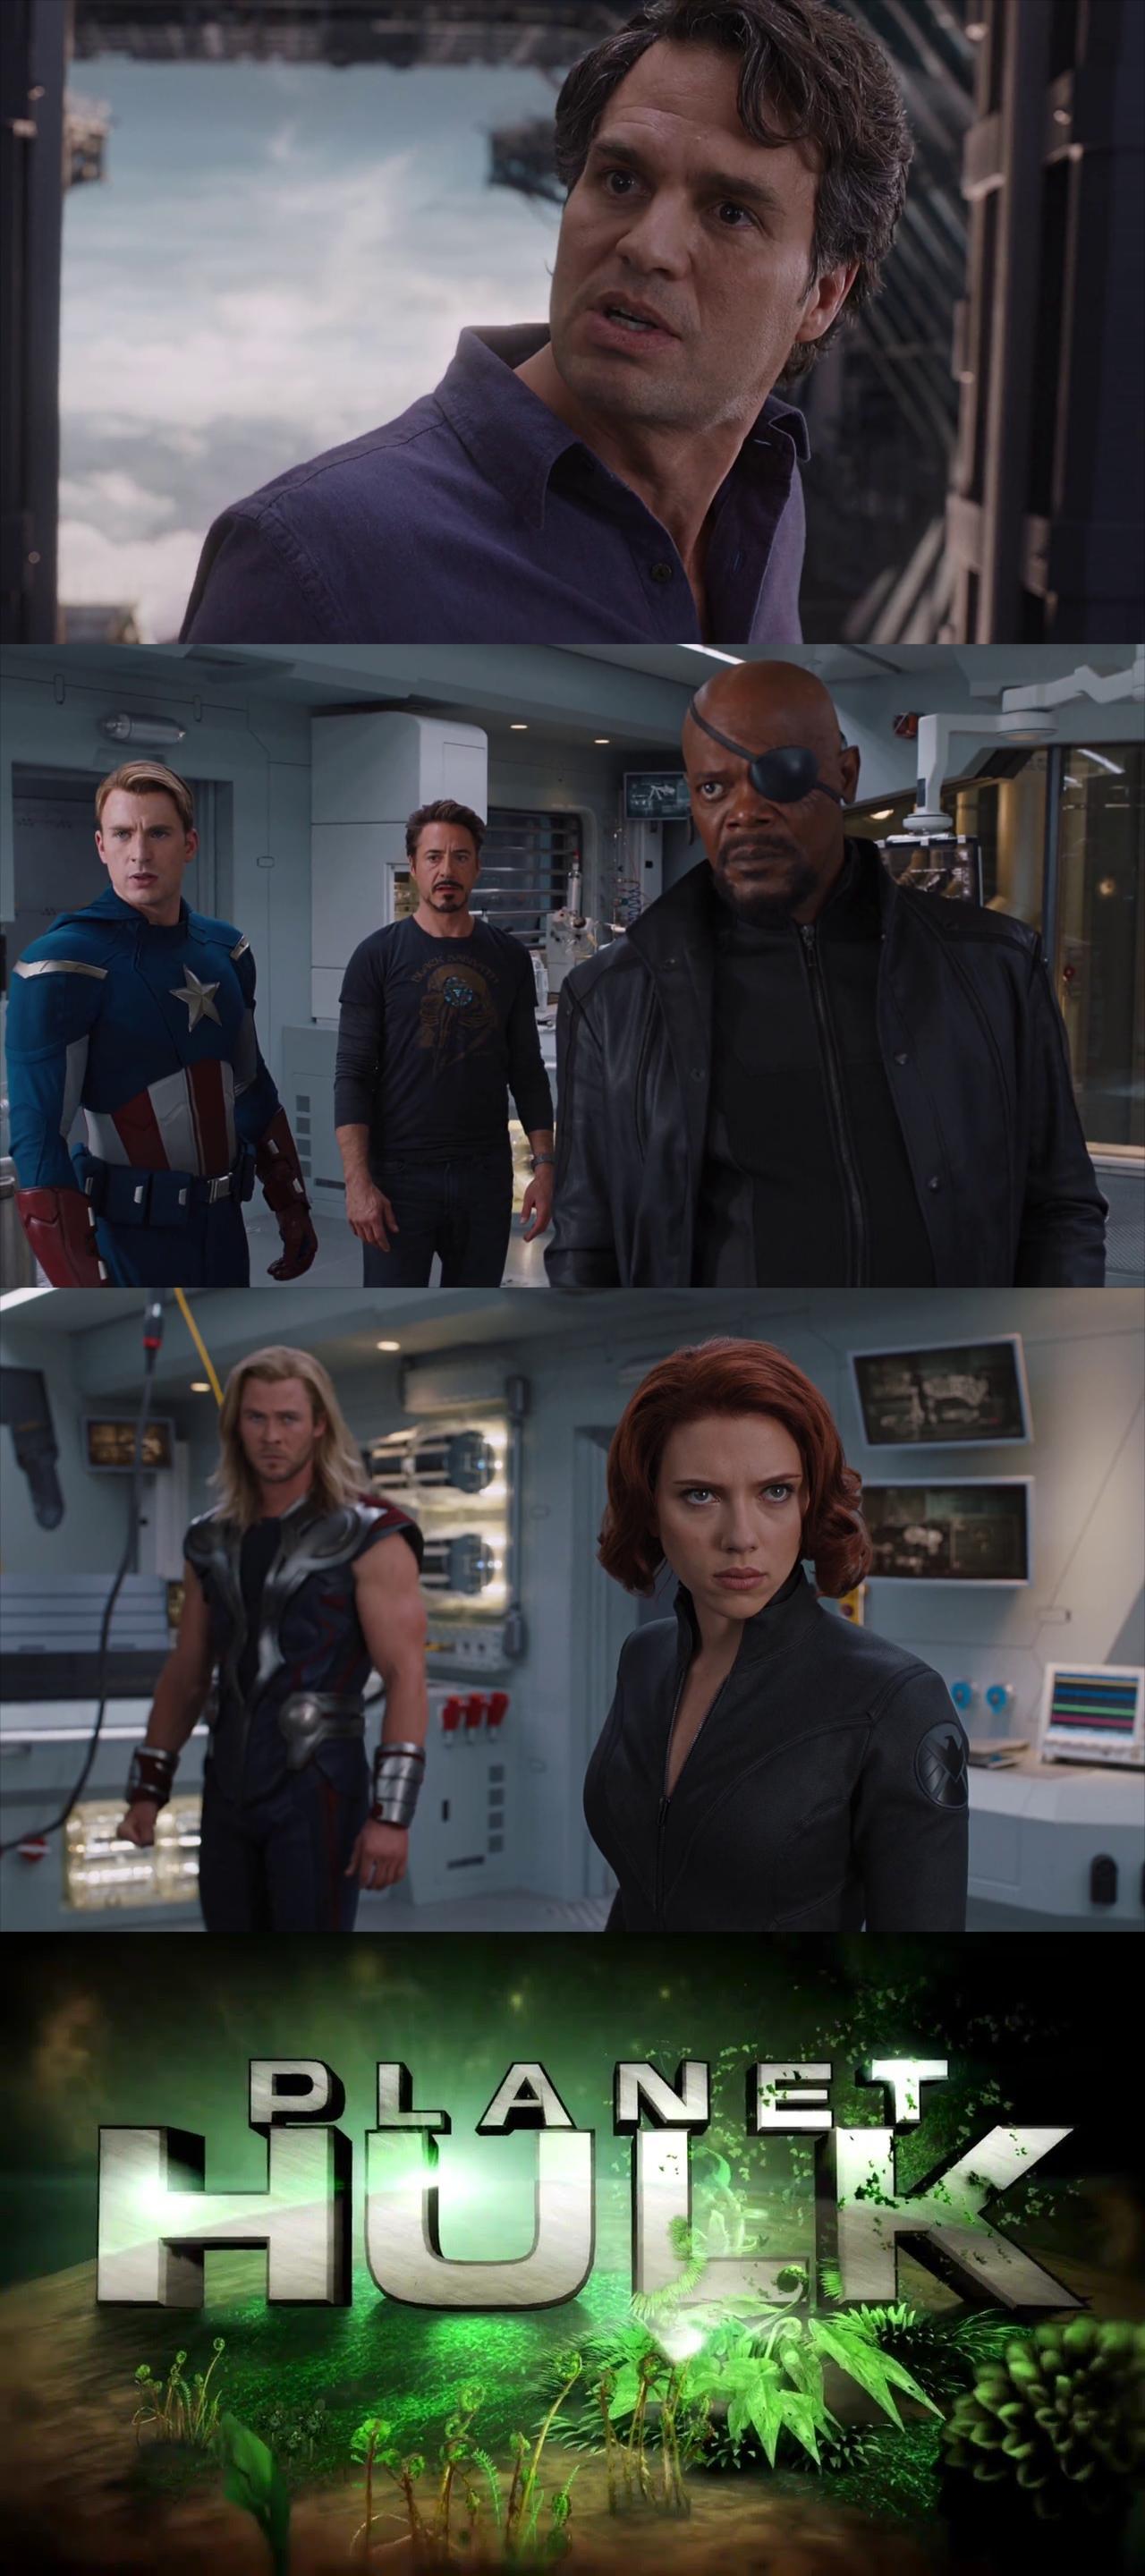 4b2 planet hulk template captain america civil war 4 pane captain